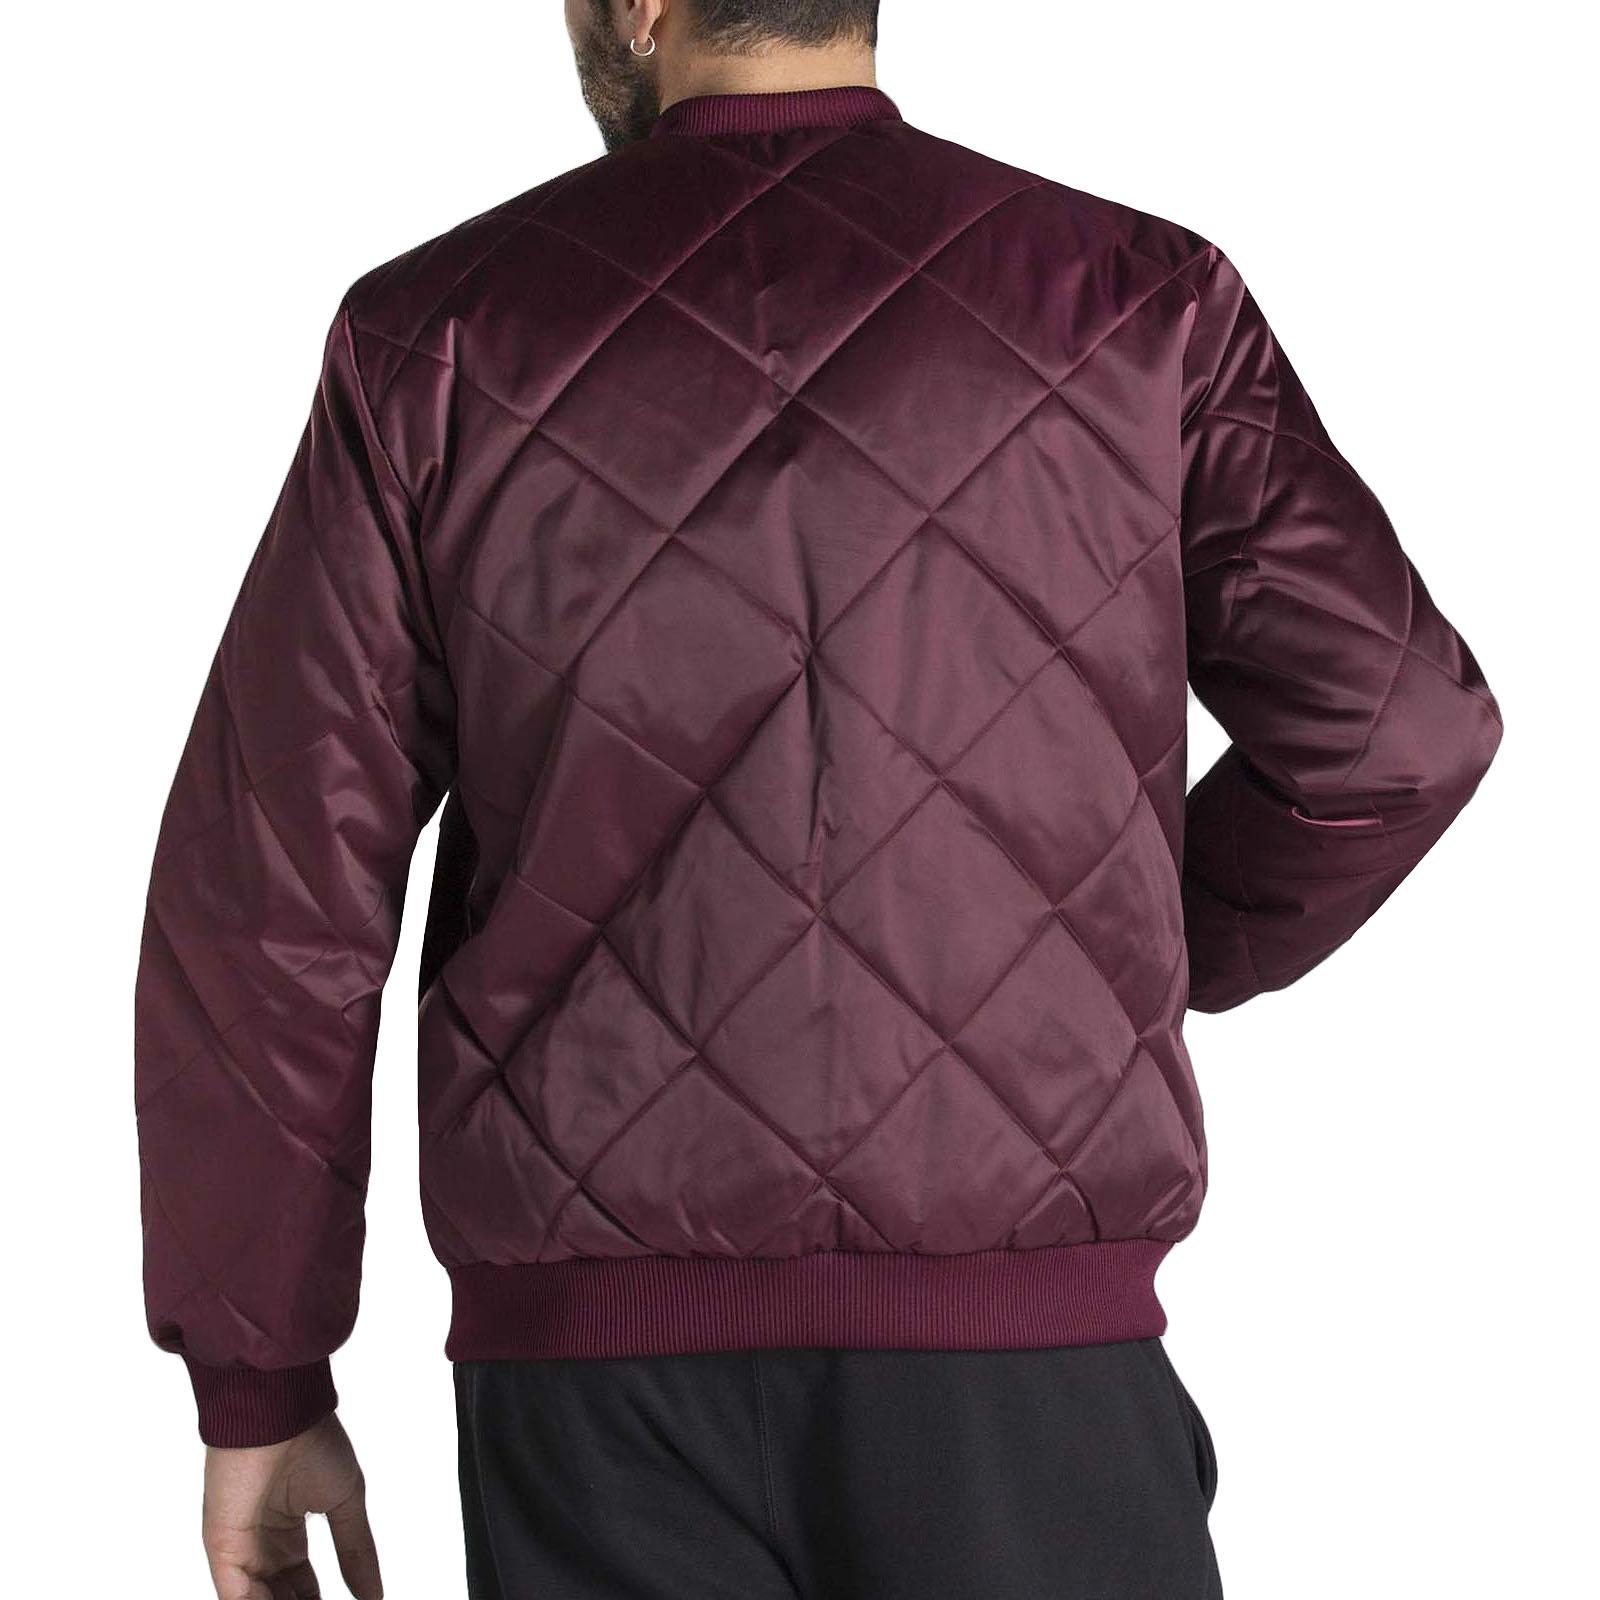 Adidas Originals Mens Superstar Quilted Zipped Long Sleeve